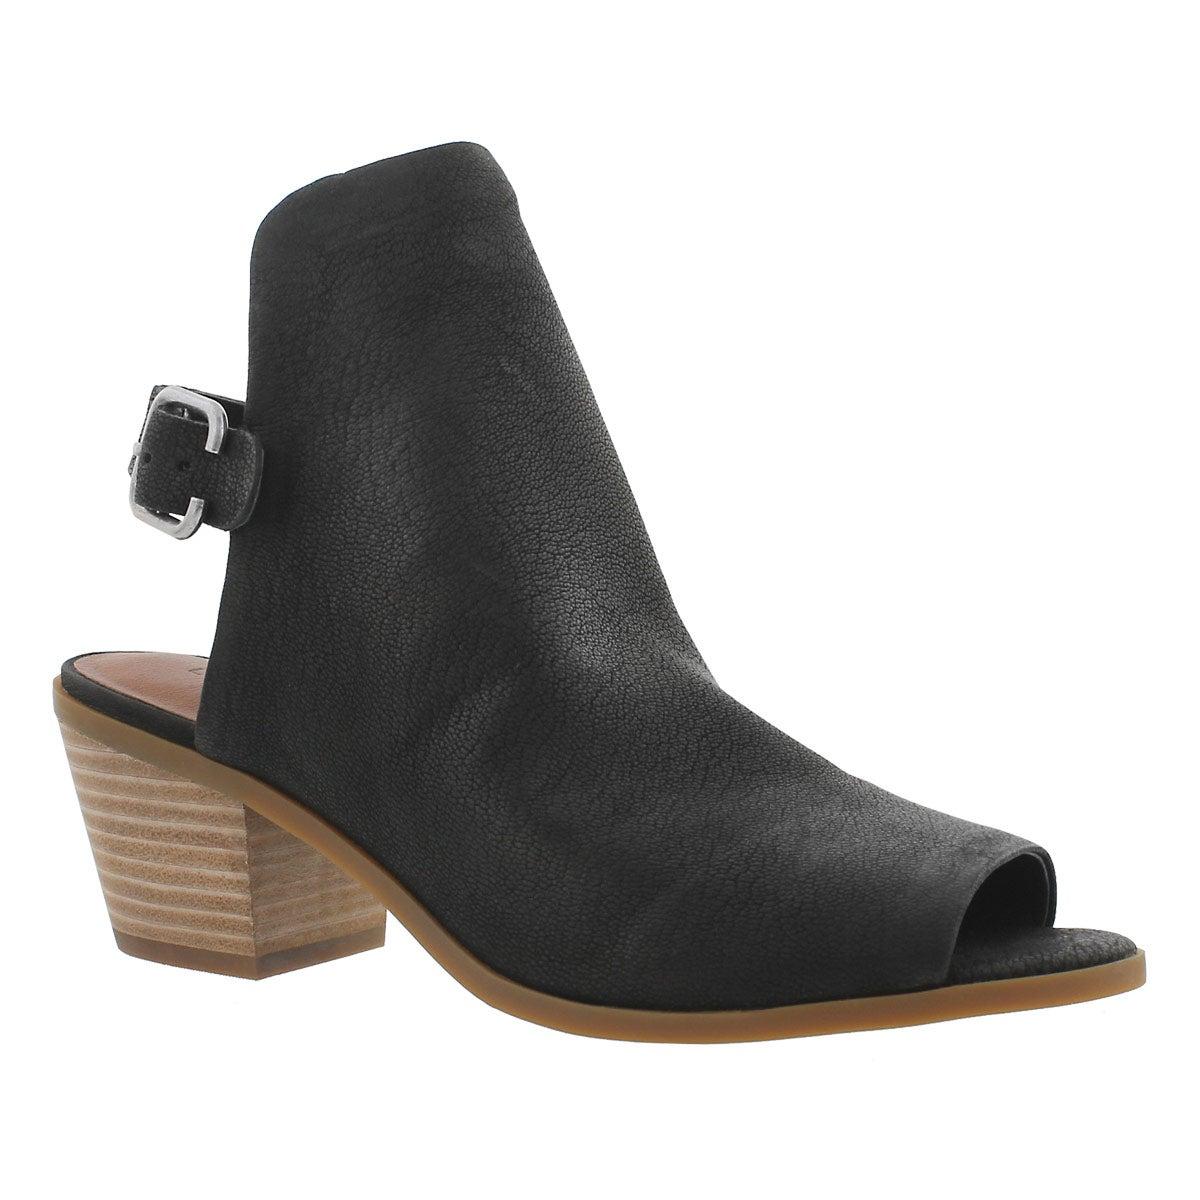 Women's BRAY black casual sandals